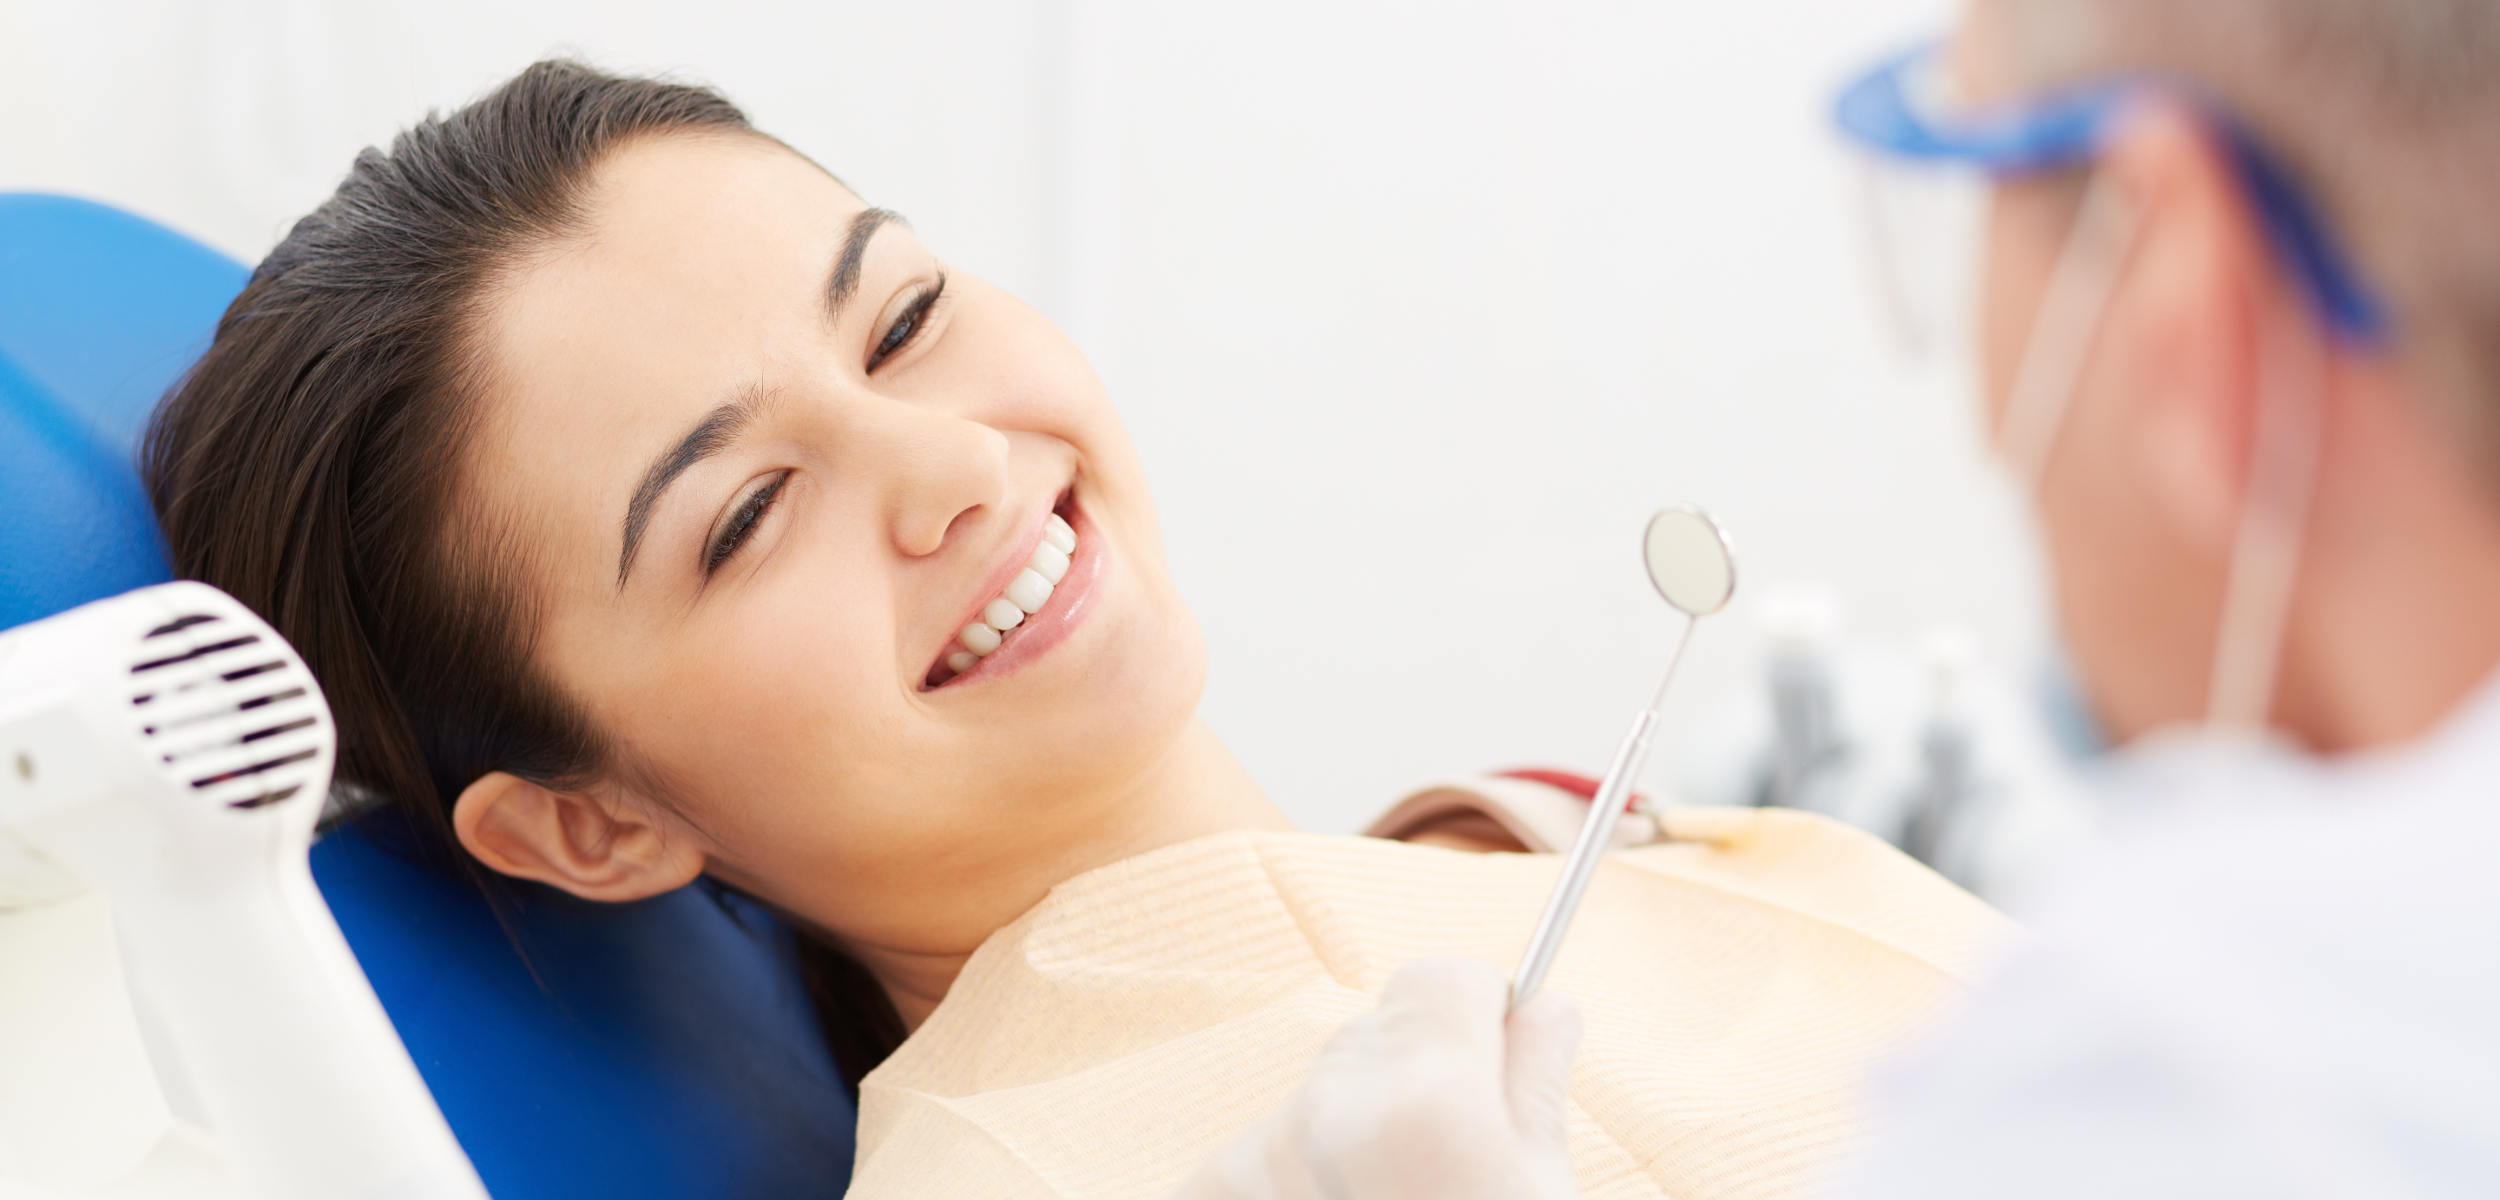 Dentiste Paris 16ème Centre dentaire - Paris 16 Victor Hugo